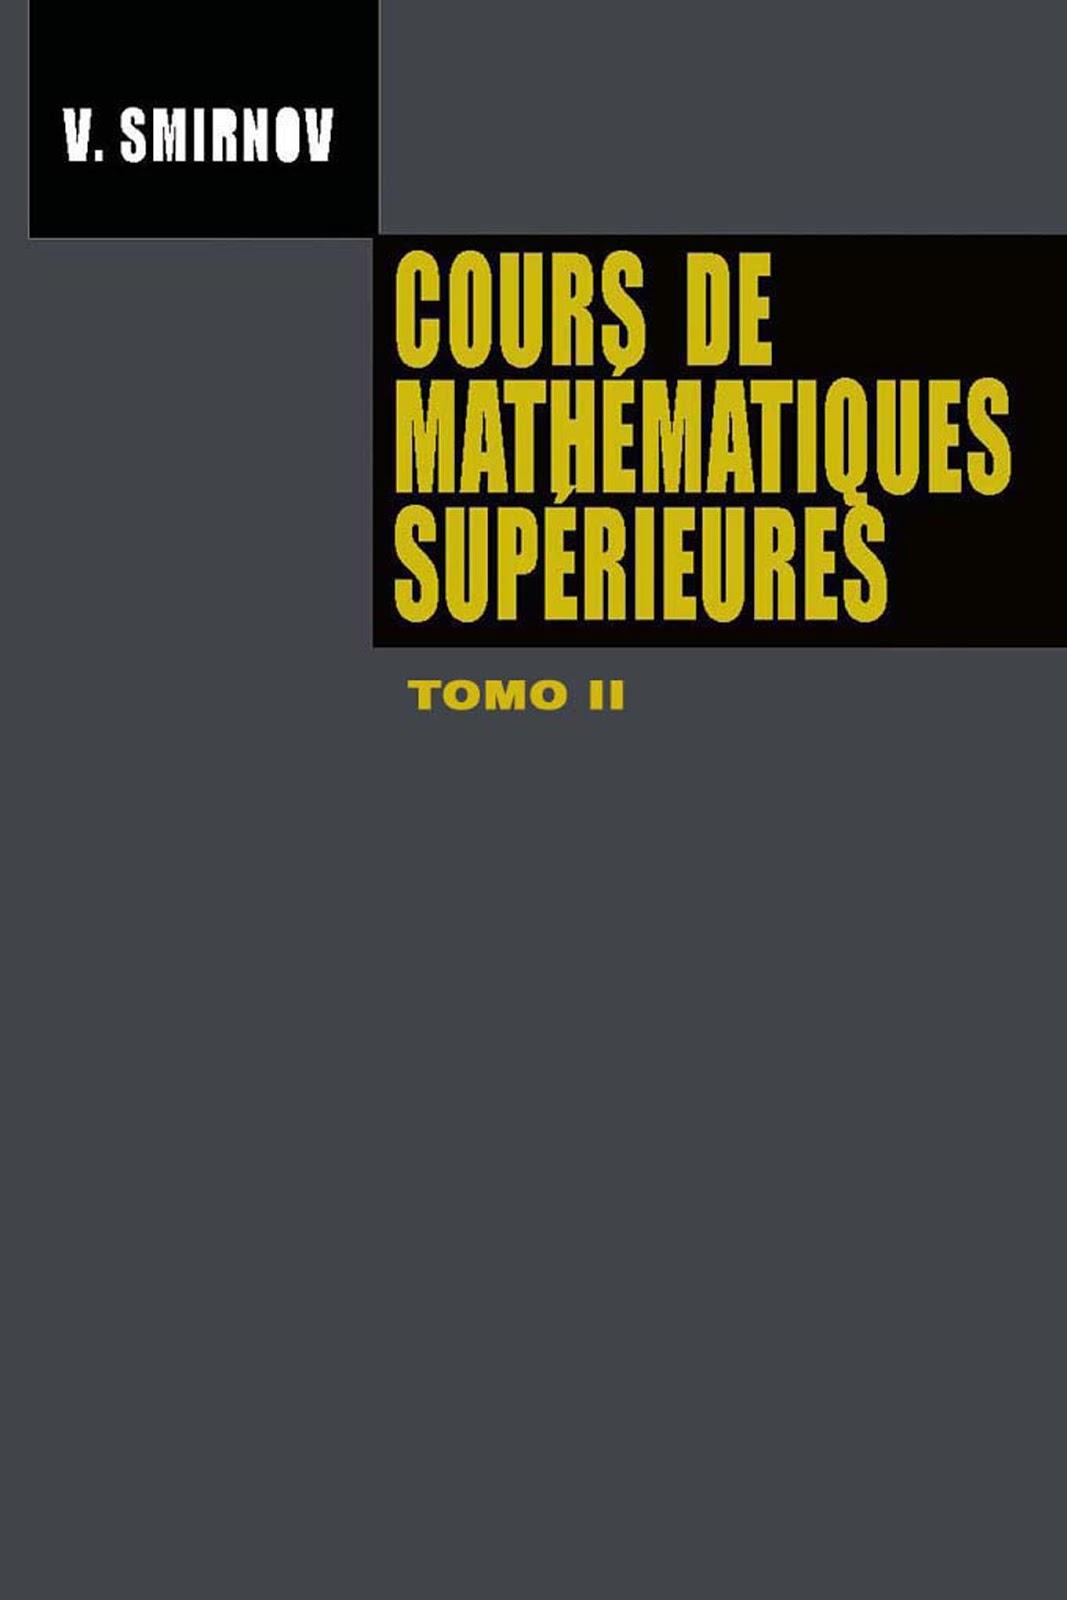 Cours de Mathématiques Supérieures, Tome II – V. Smirnov